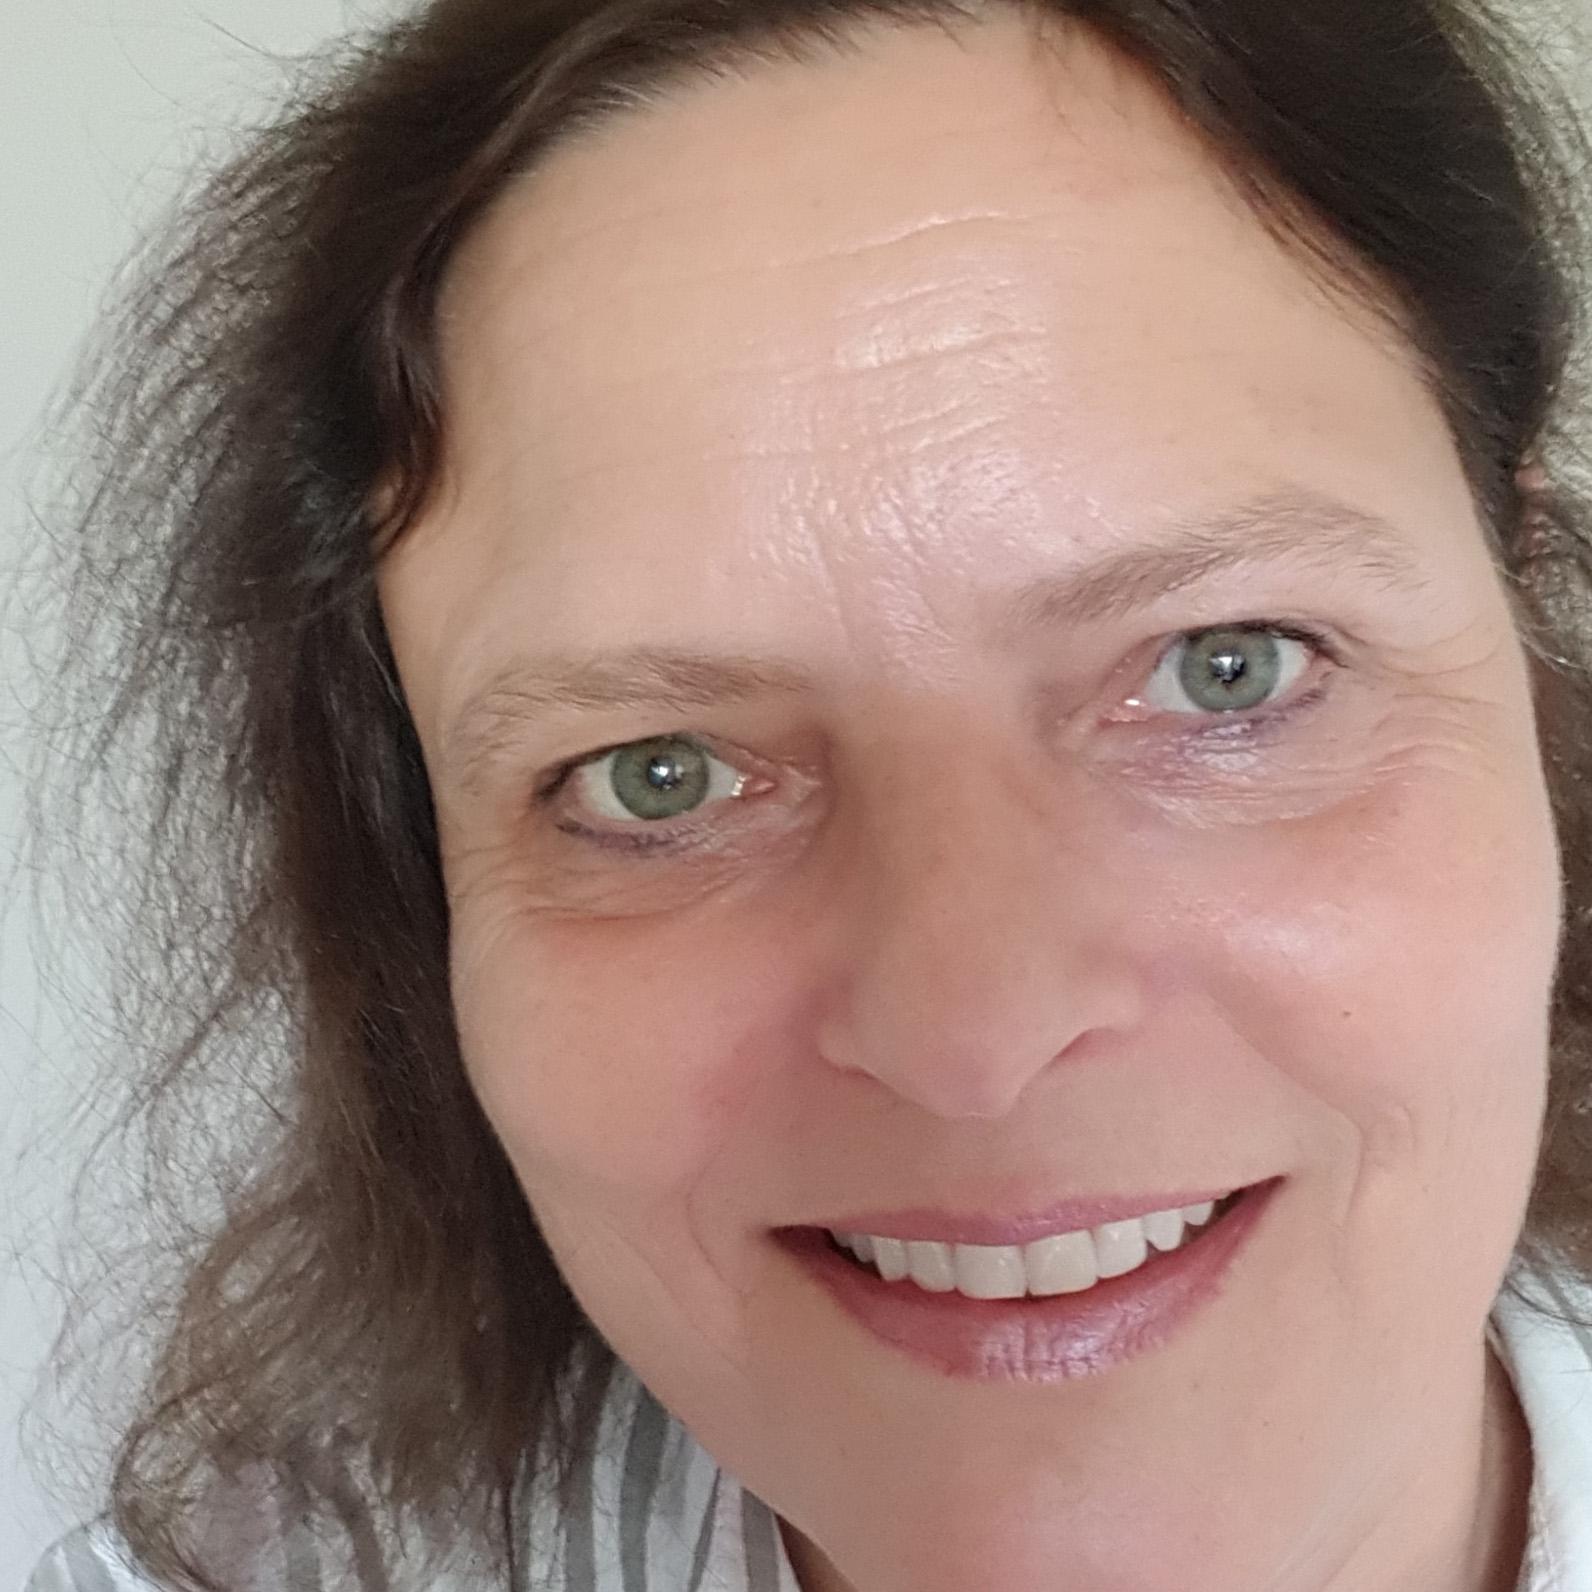 Claudia Knöpfle